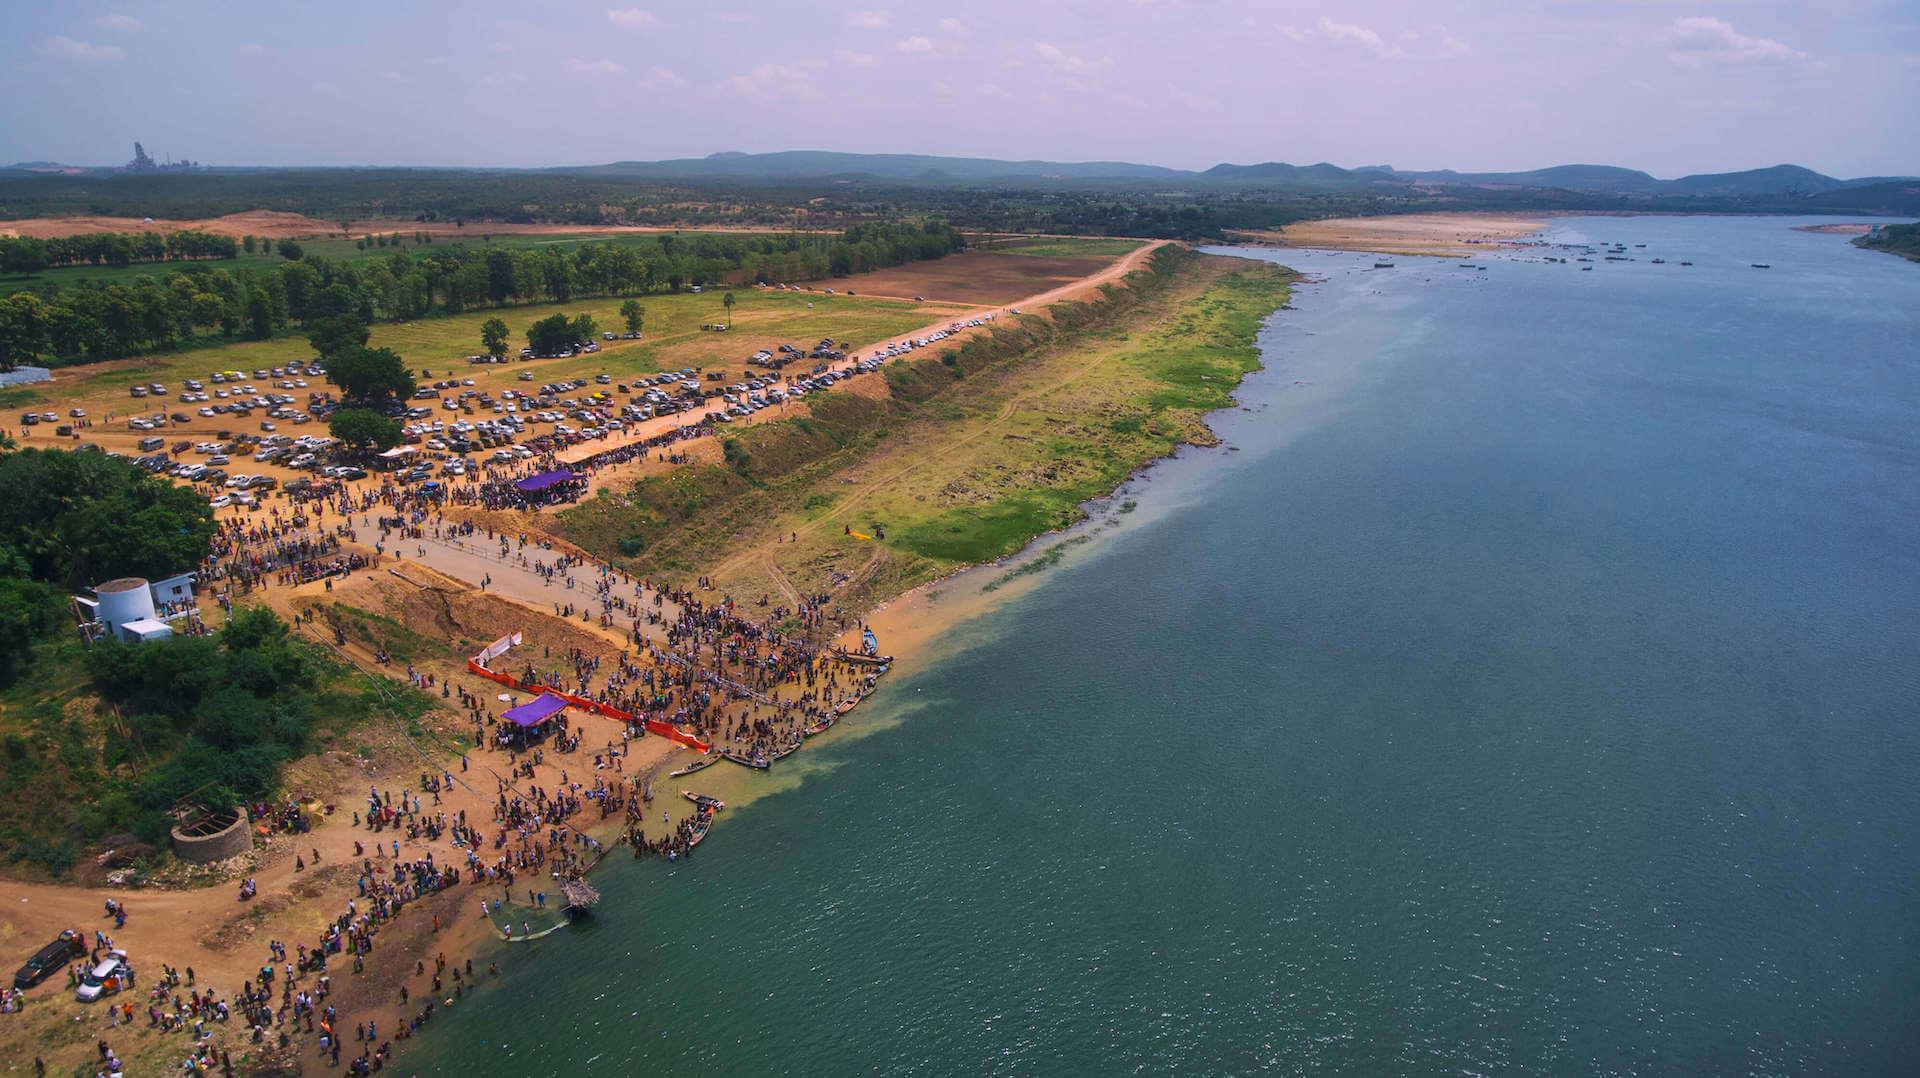 Alakananda RiverFront - Krishna Pushkaralu 1